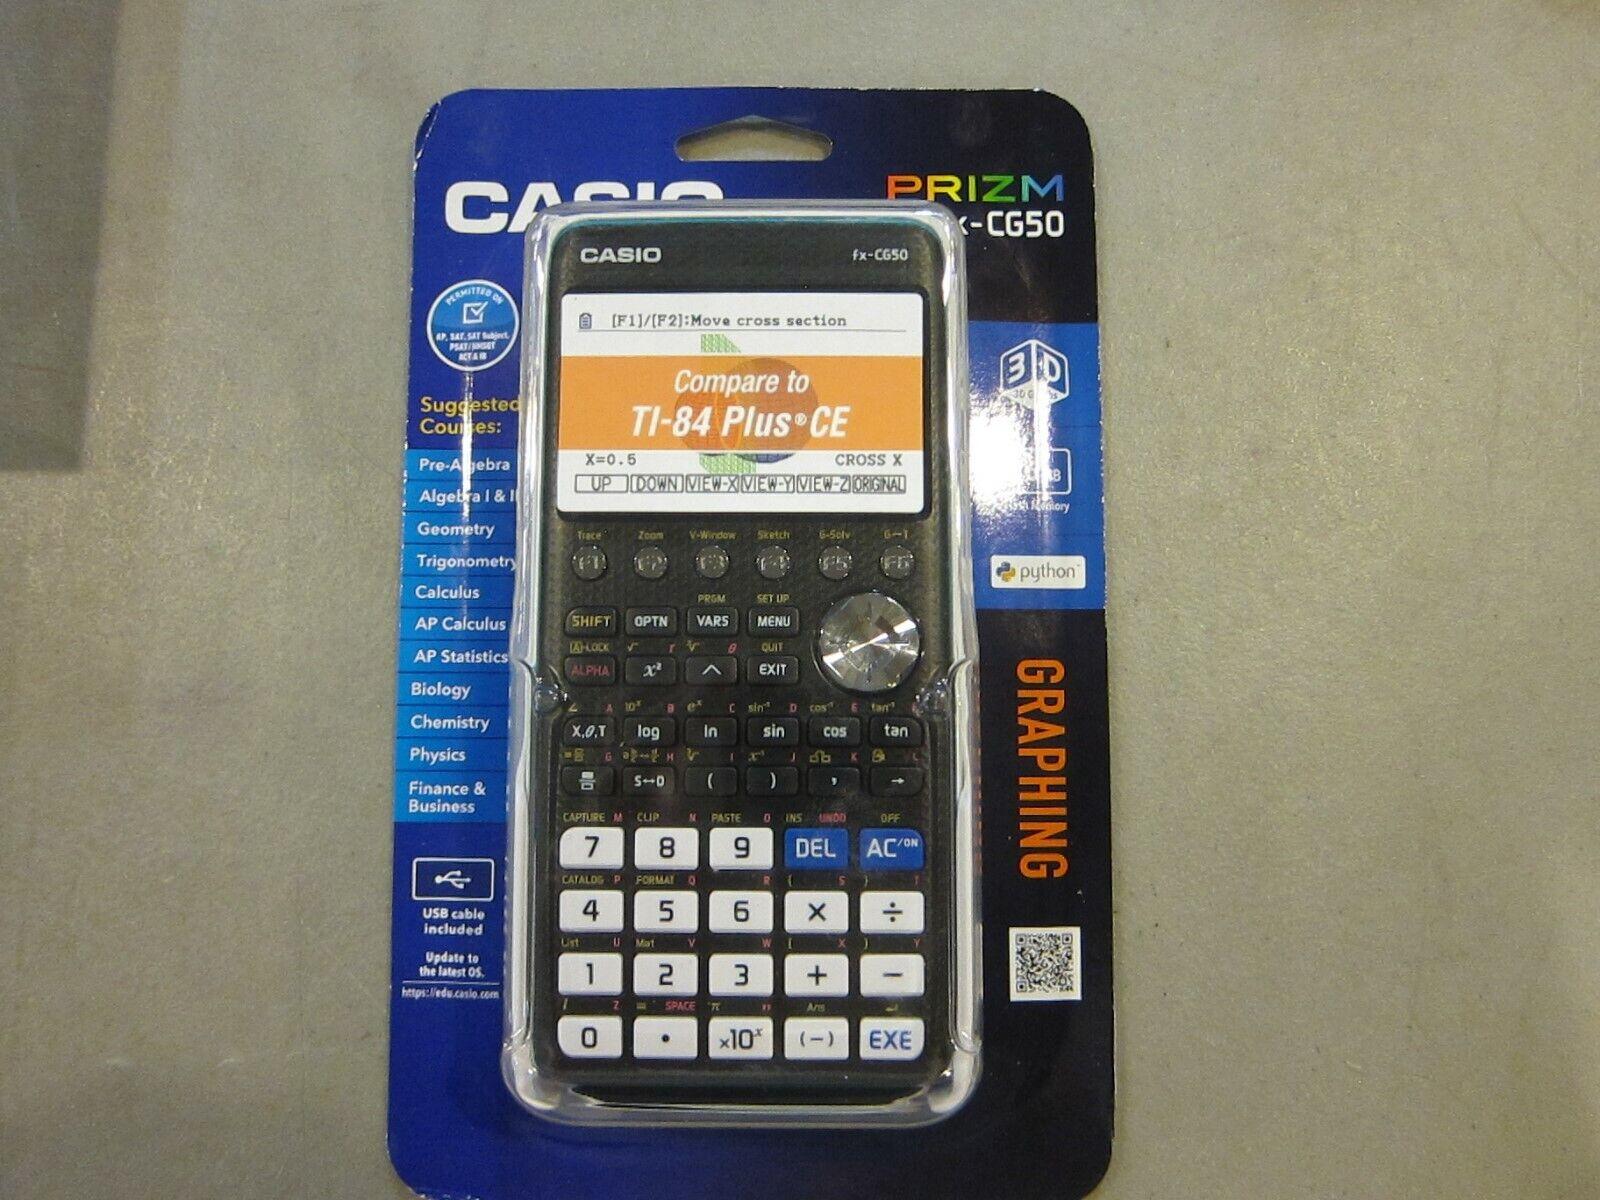 Casio Prizm Fx-CG50 Graphing Calculator - BRAND NEW SEALED -